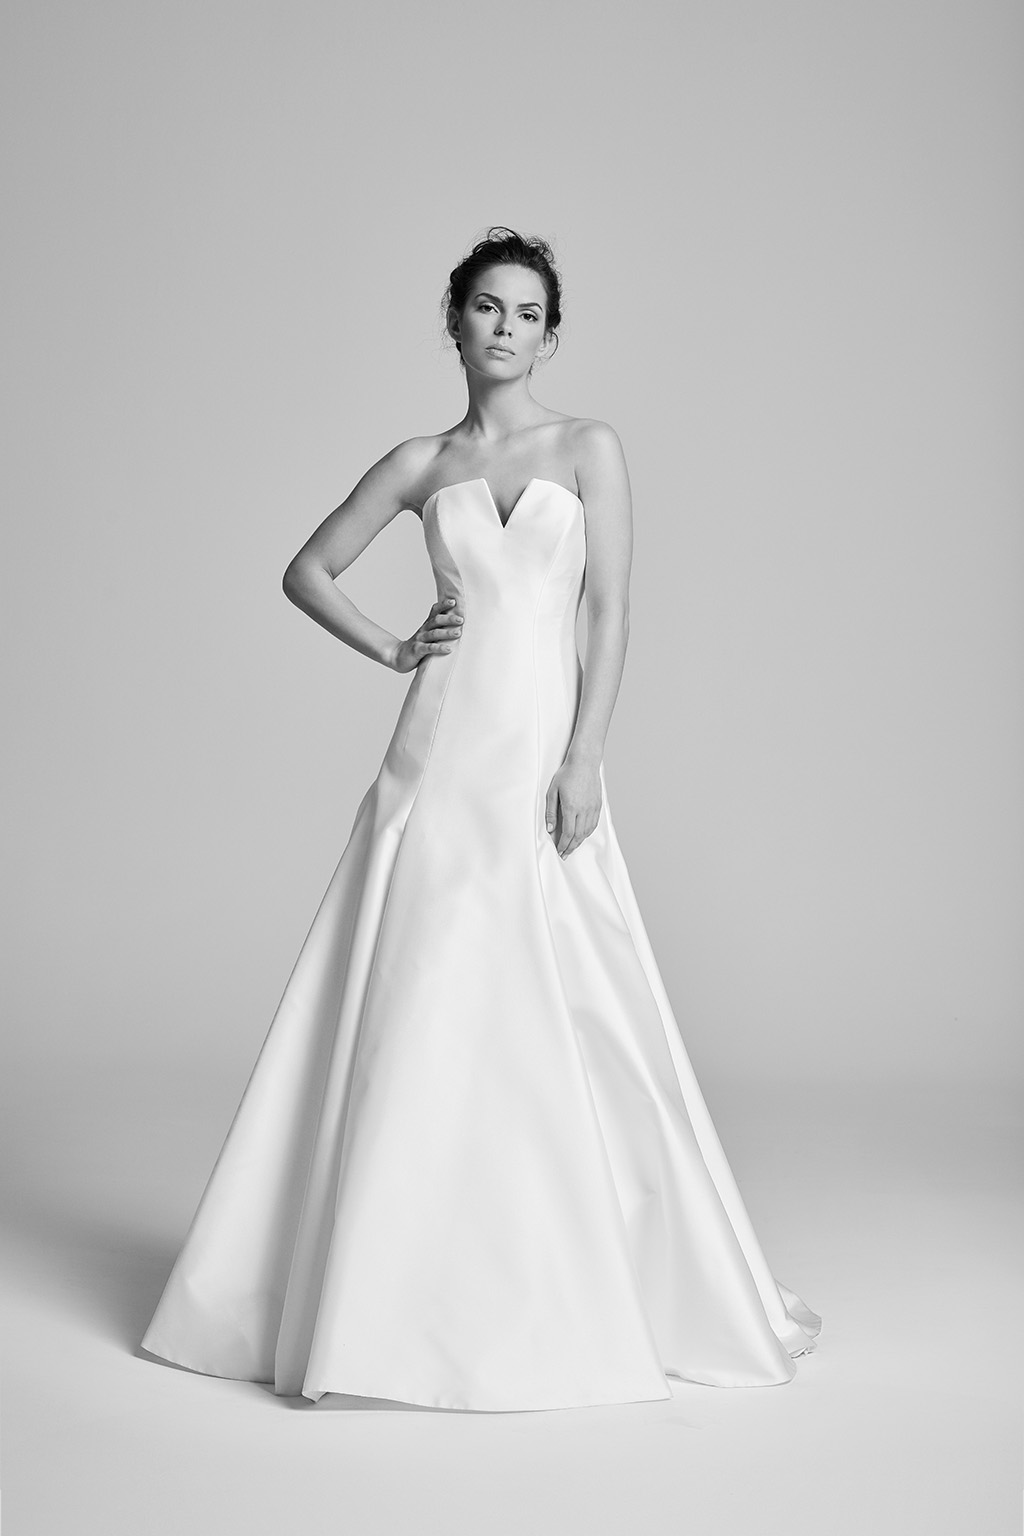 ralston-bridalcouture-wedding-dresses-uk-belle-epoque-collection-2018-by-designer-suzanne-neville